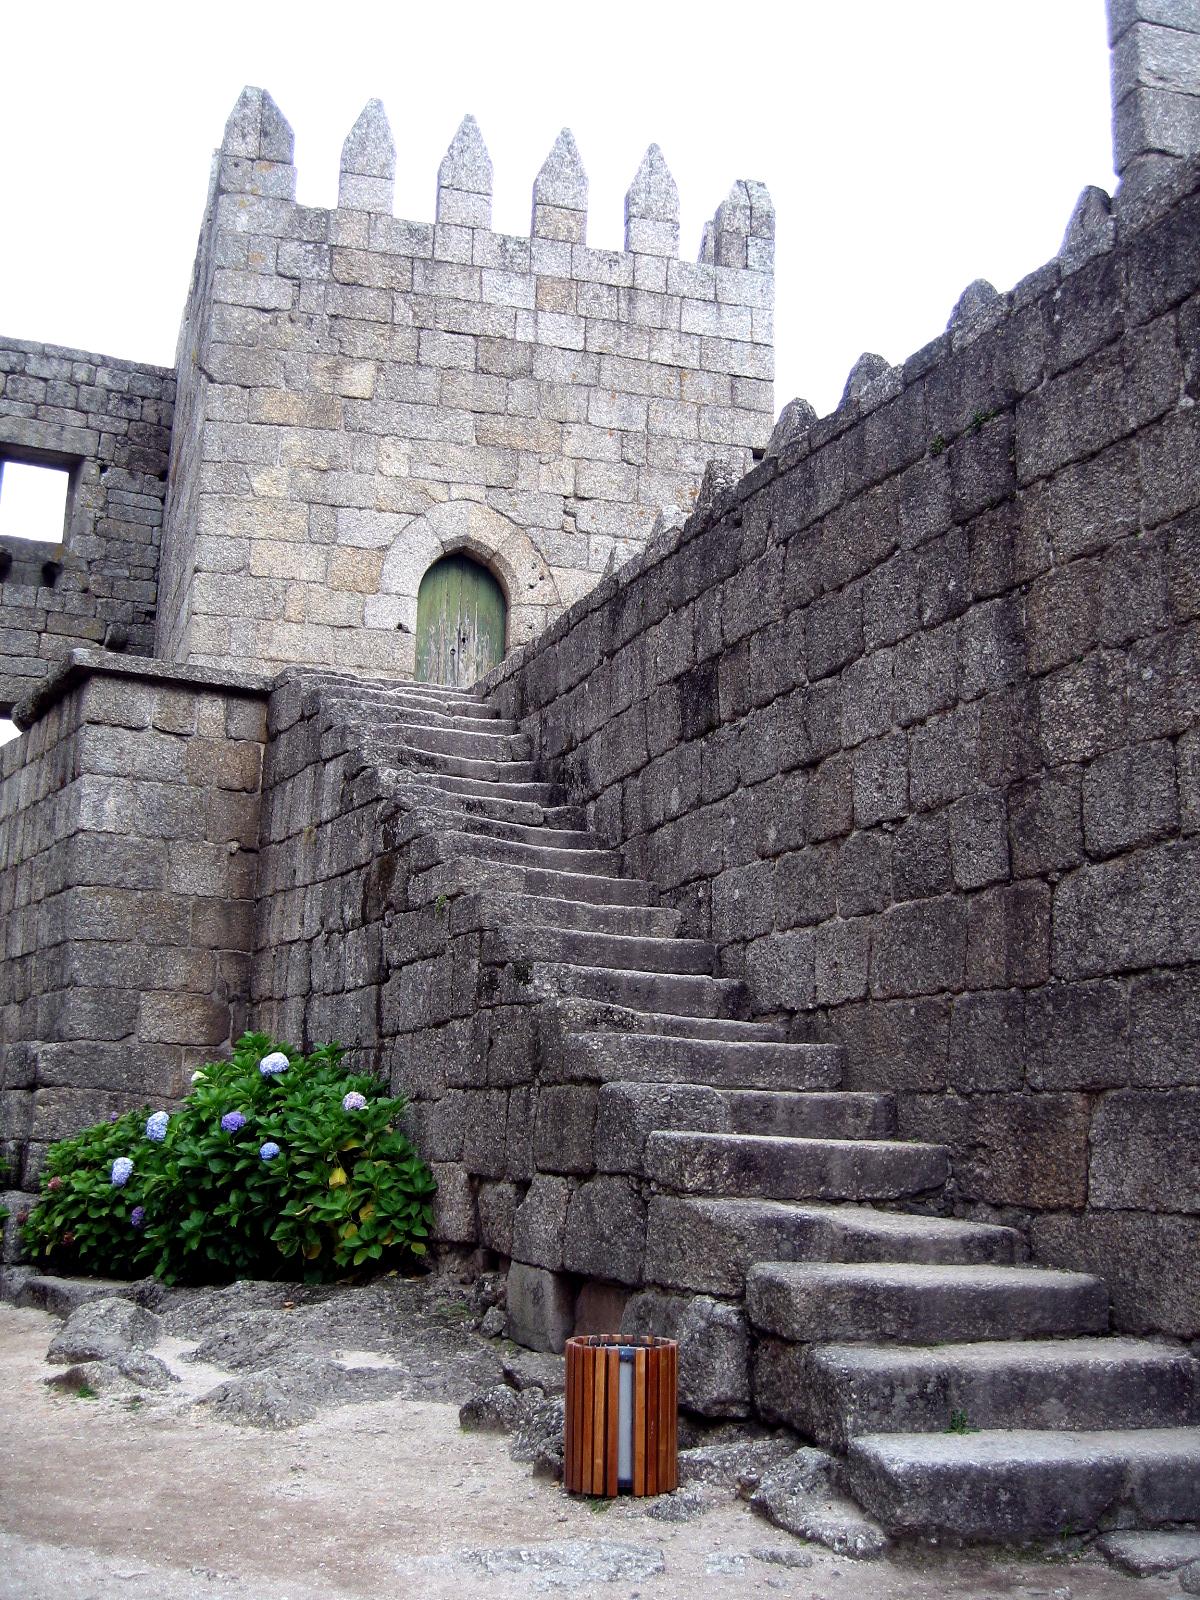 Лестница, ведущая на стену замка Гимарайнш